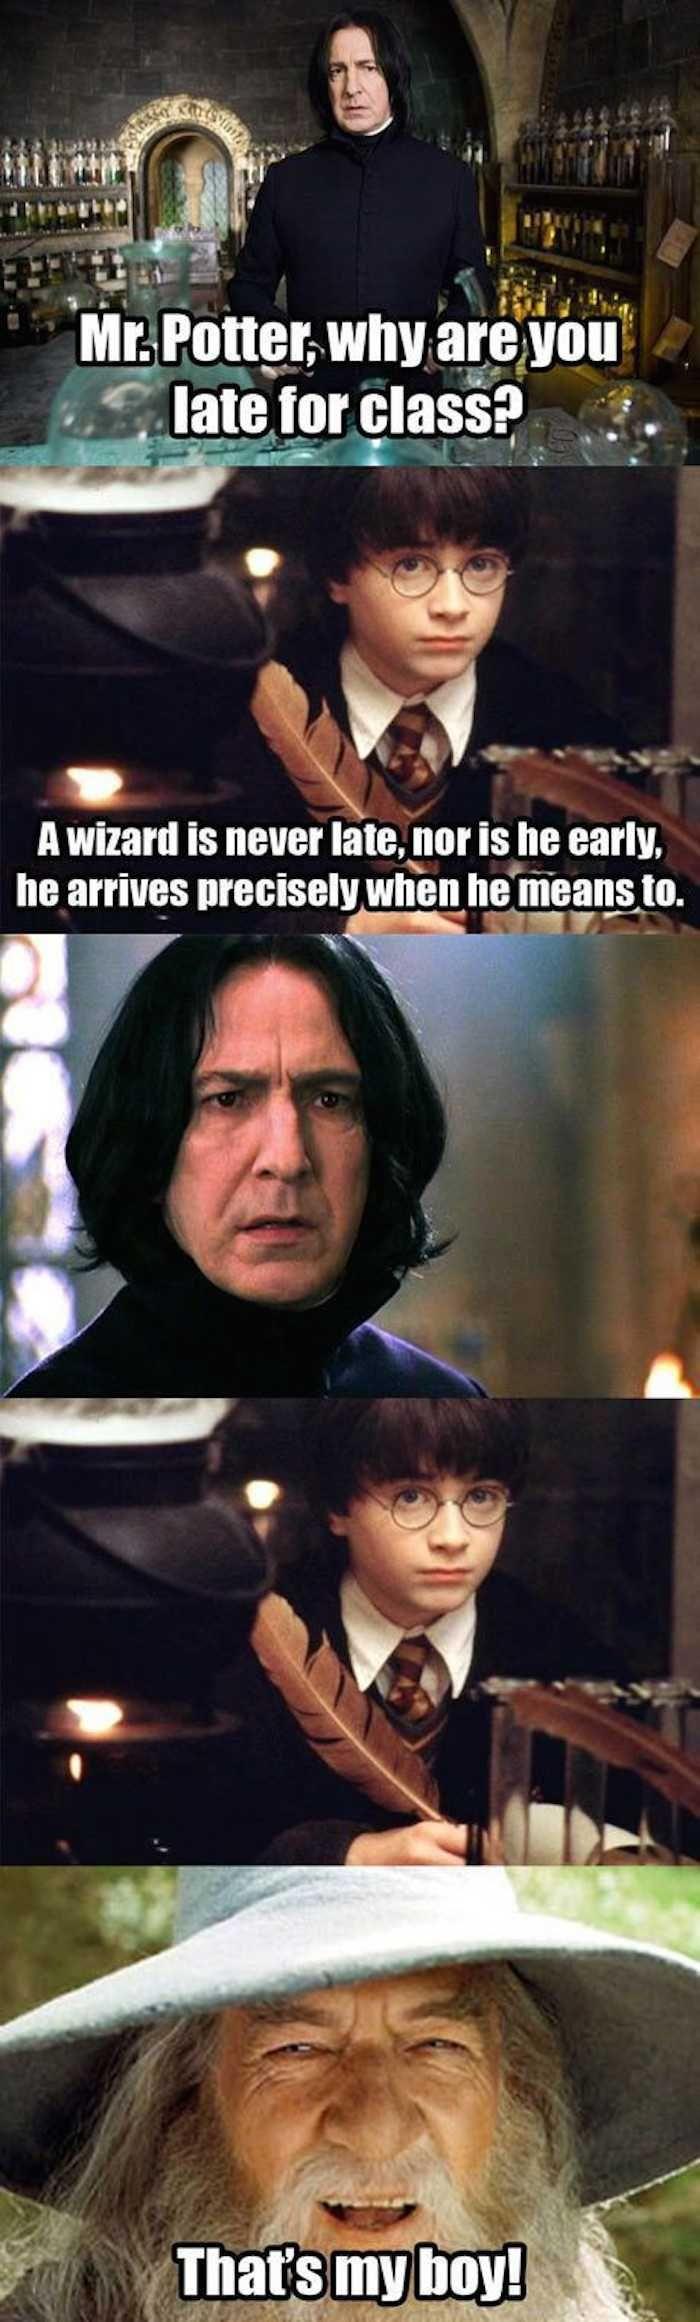 35 Magical Memes To Celebrate Harry Potter S 20th Anniversary Harry Potter Quotes Funny Harry Potter Puns Harry Potter Memes Hilarious